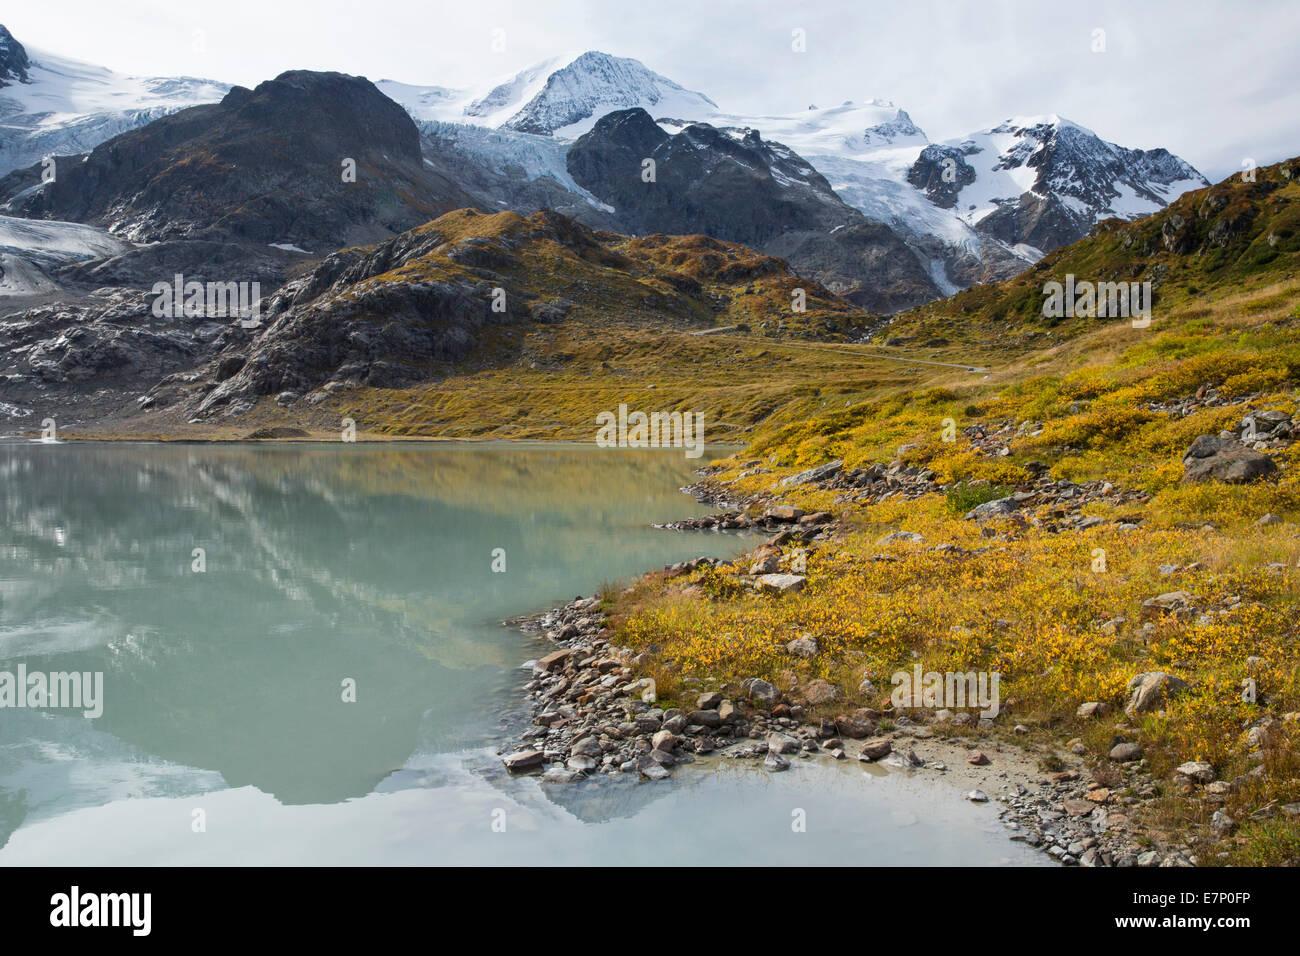 lake Stein, Steinsee, Gwächtenhorn, Tierberg, Susten Pass, clouds, cloud, mountain, mountains, mountain lake, - Stock Image